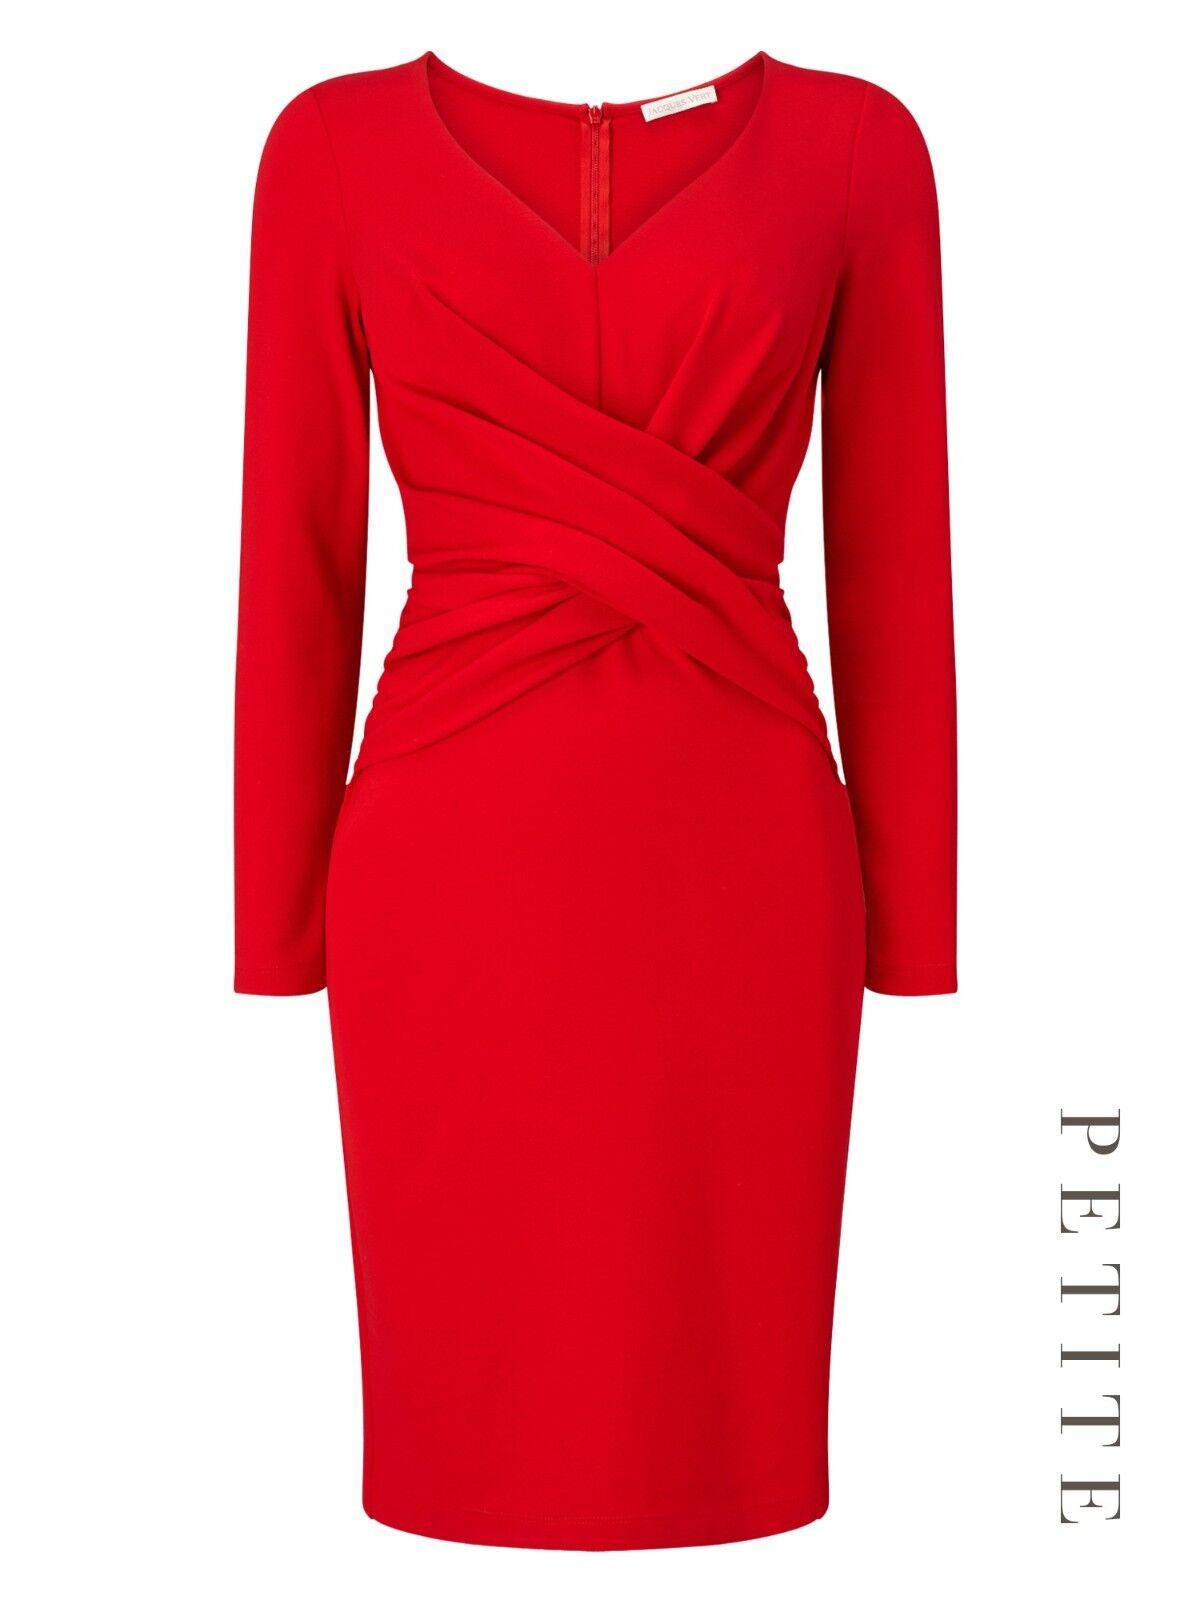 Jacques Grün Petite Ponte Dress Größe UK 18 rot rot rot rrp  DH089 OO 07 | Shop Düsseldorf  | Ab dem neuesten Modell  | Internationale Wahl  d16e41